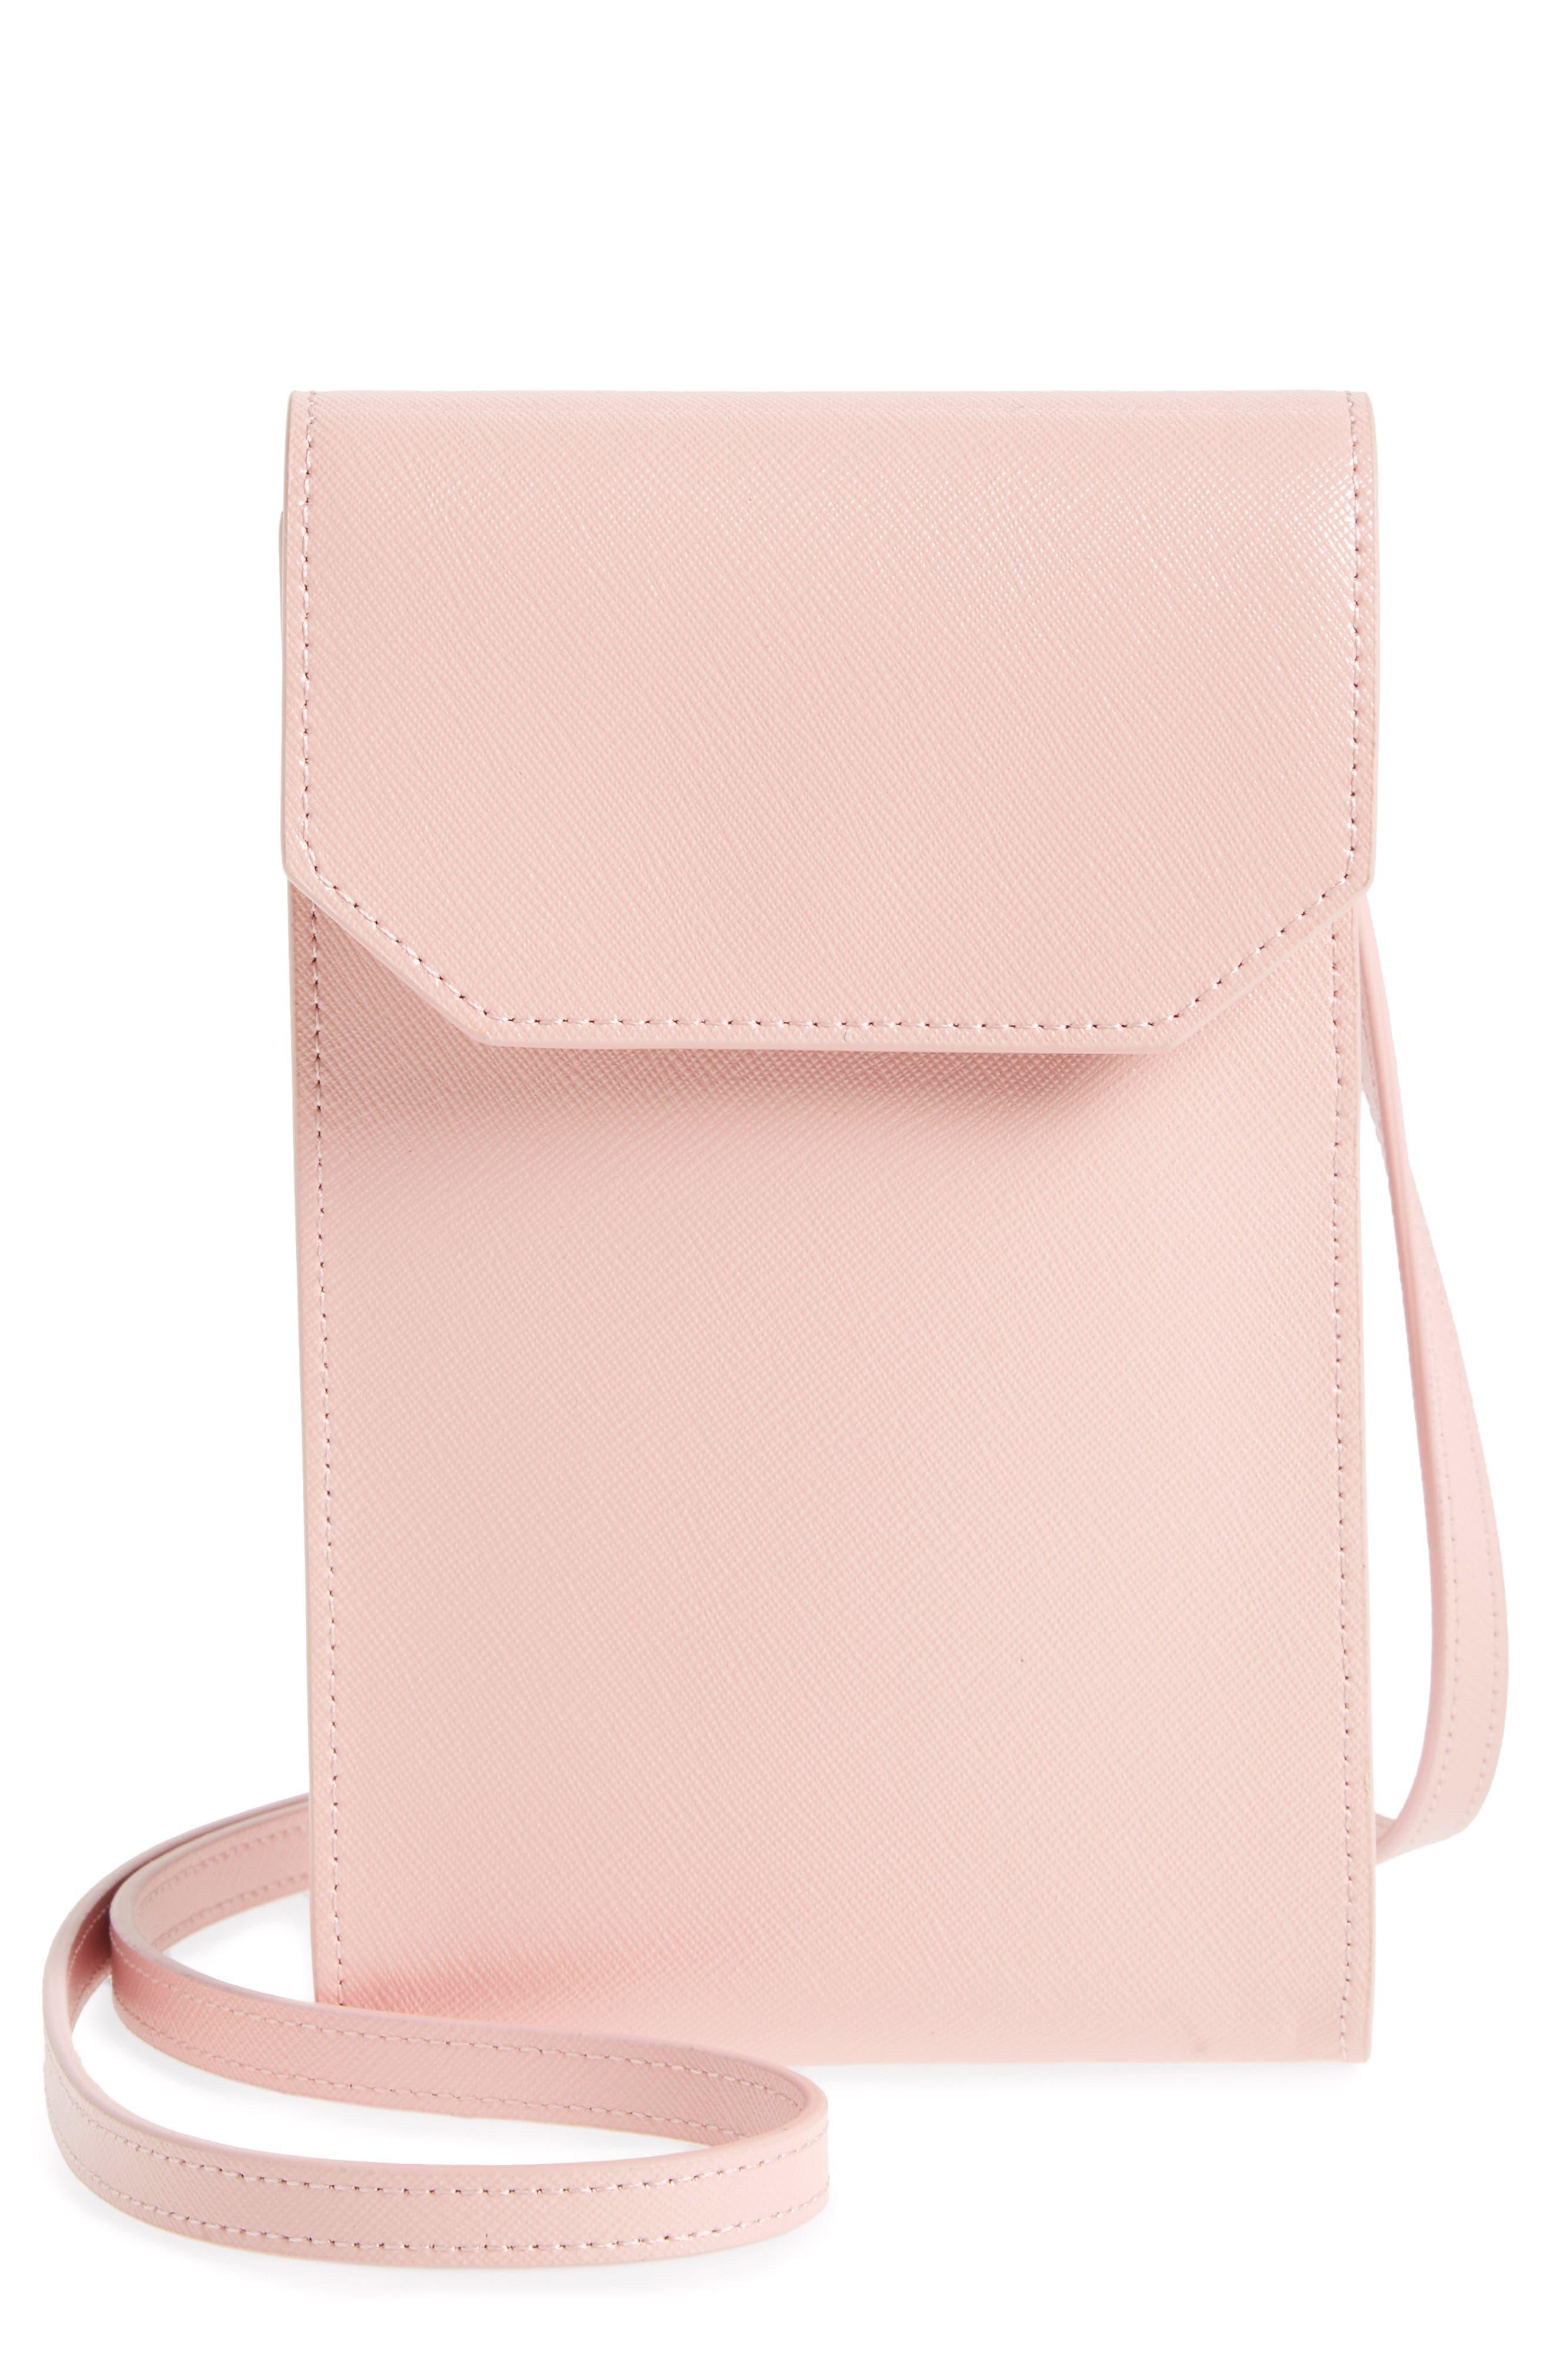 Nordstrom Leather Phone Crossbody Bag